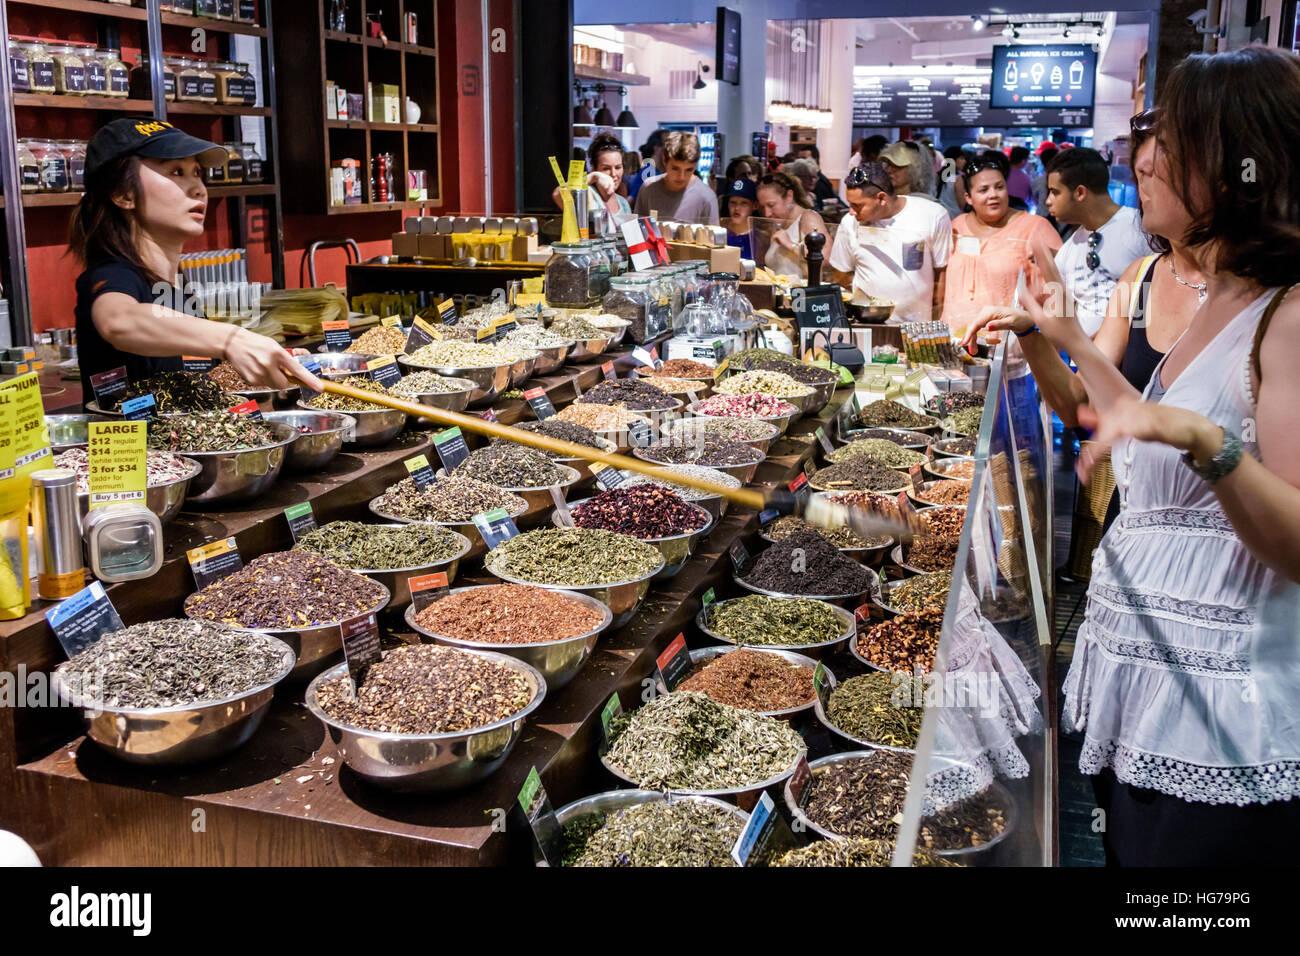 Chelsea Market manhattan new york city nyc ny chelsea chelsea market spices and